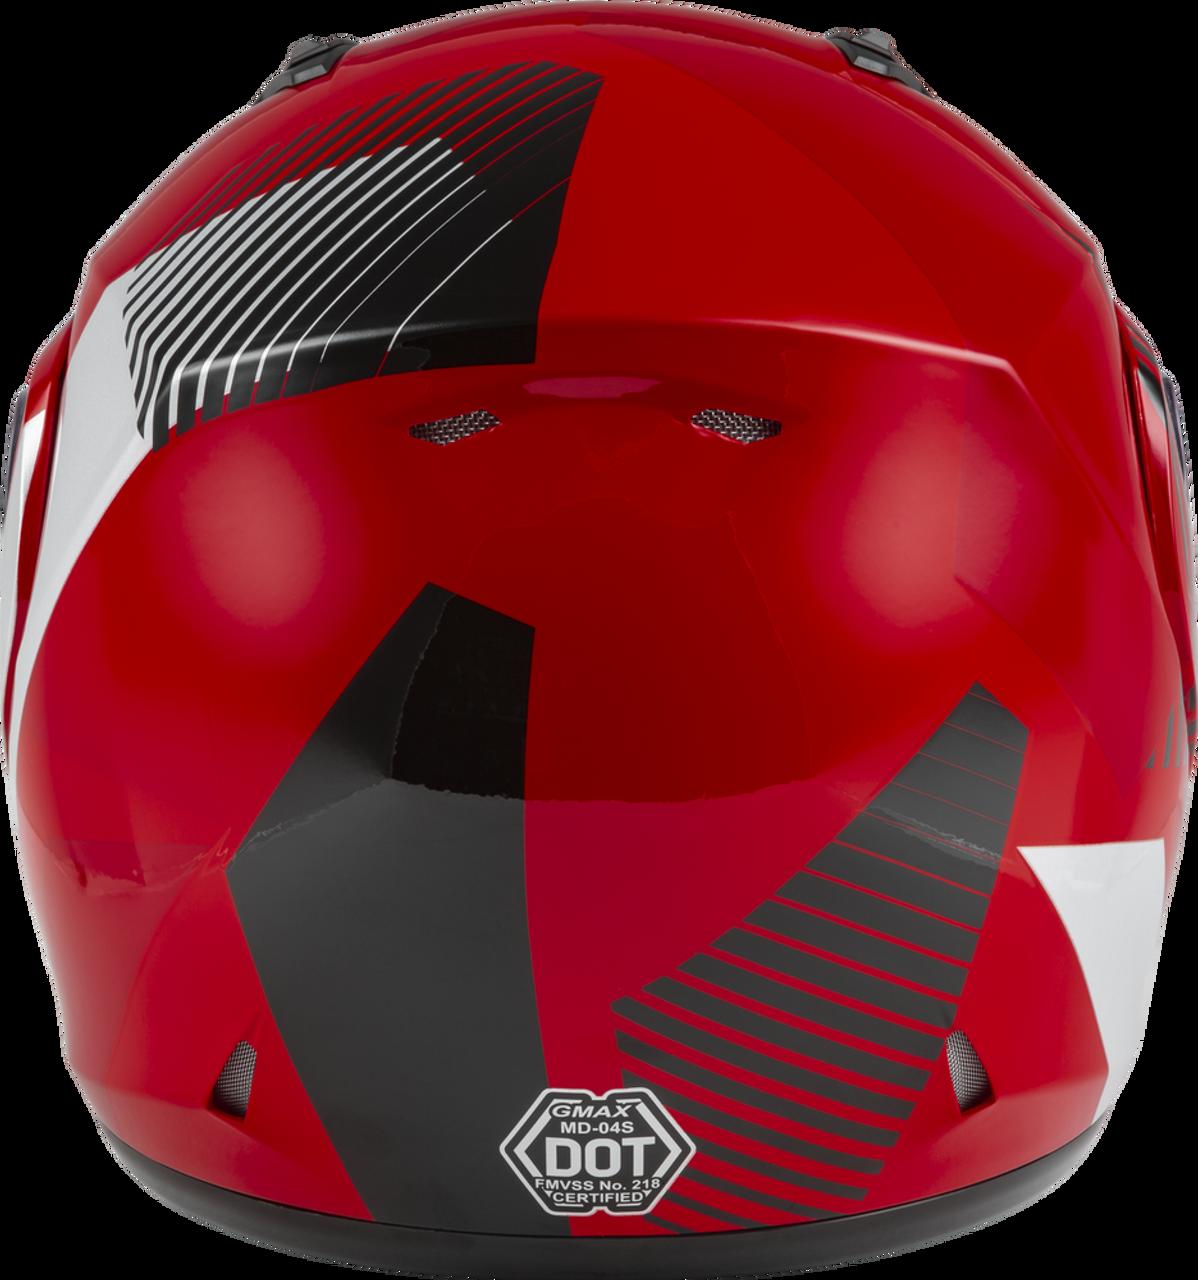 GMAX MD-04S Modular Reserve Snow Helmet Red/Silver/Black